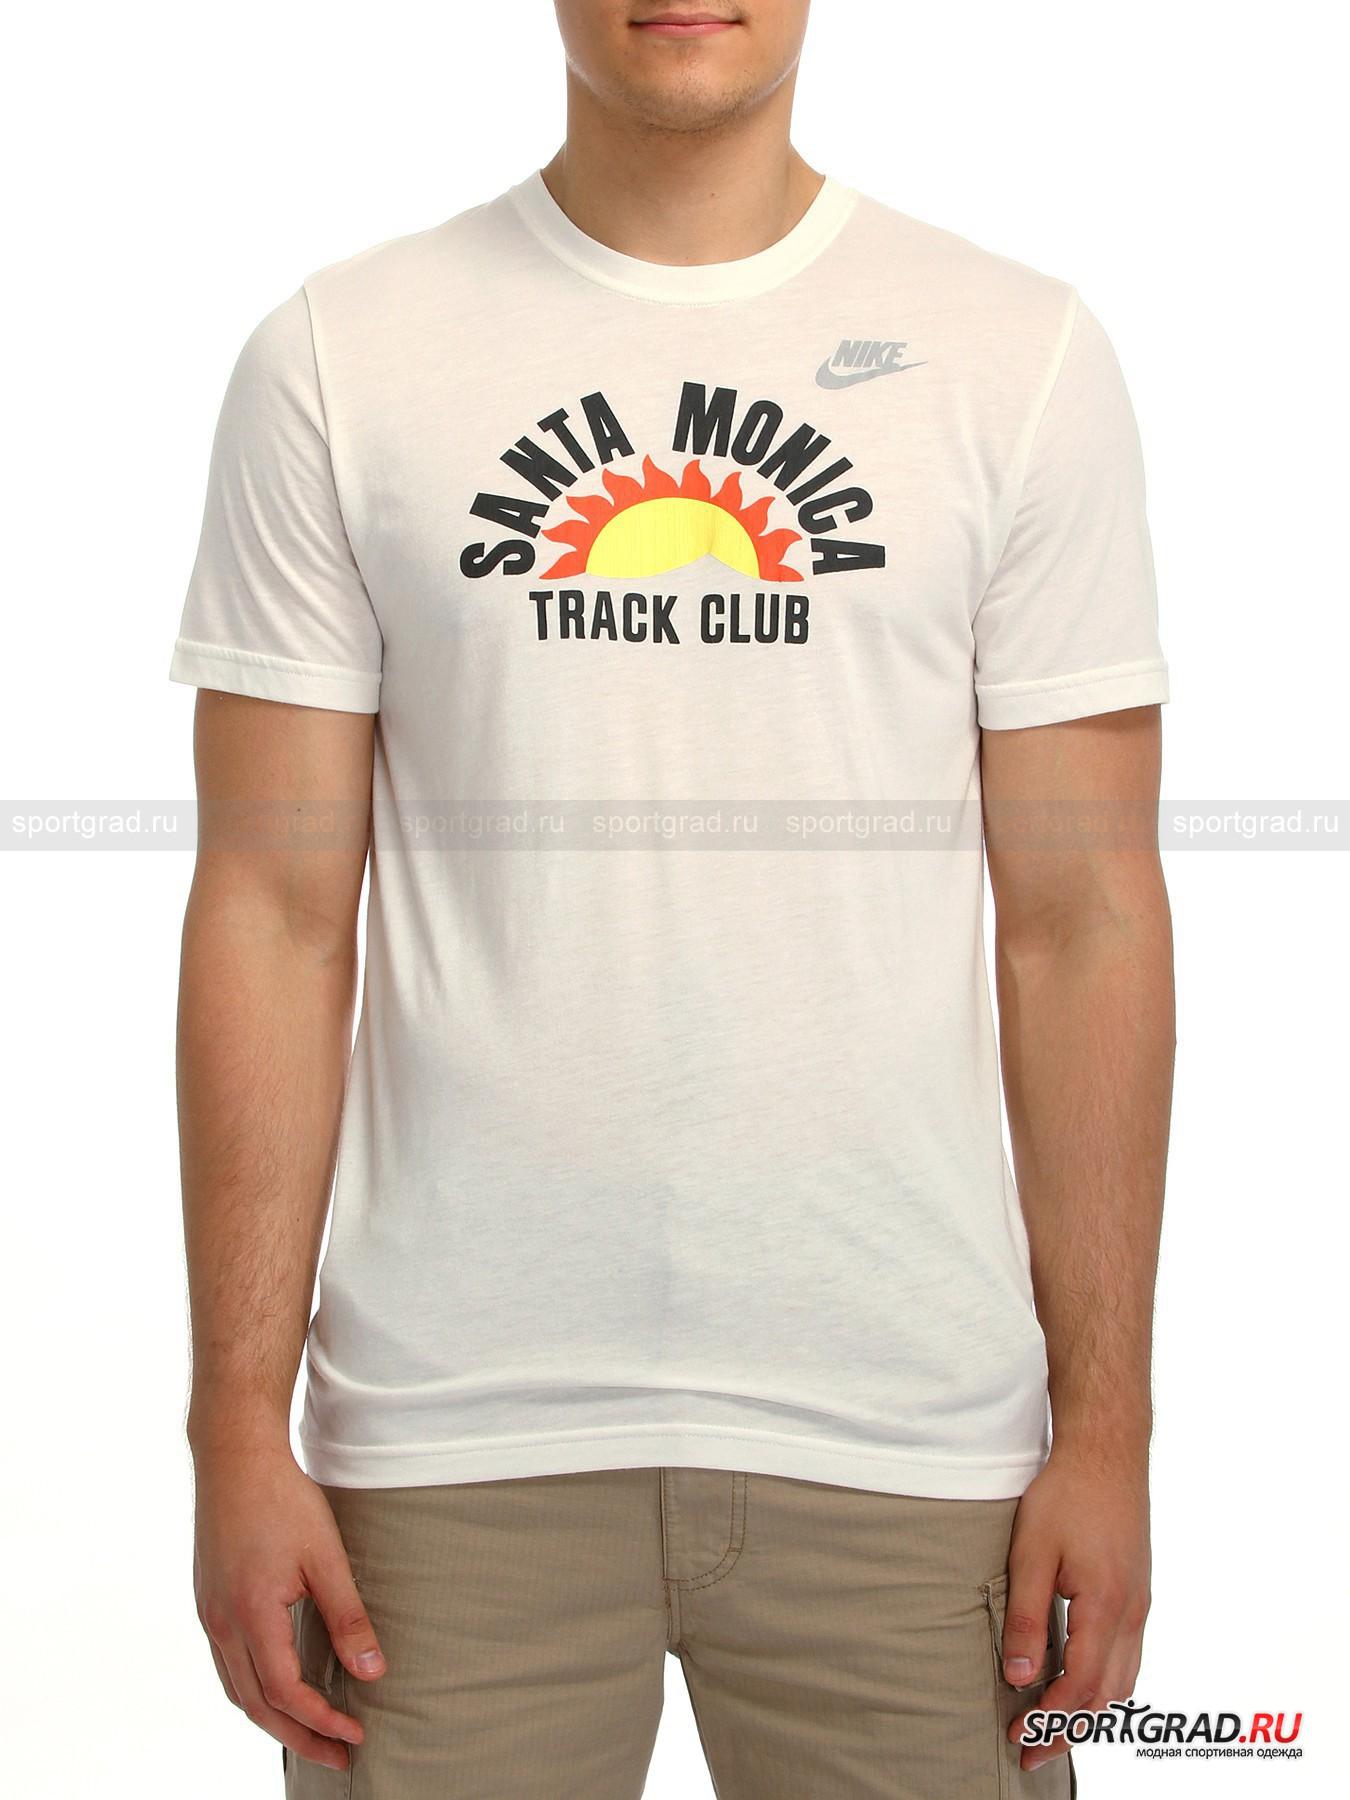 Футболка  мужская  RU SANTA MONICA TRACK CLUB TEE NIKE